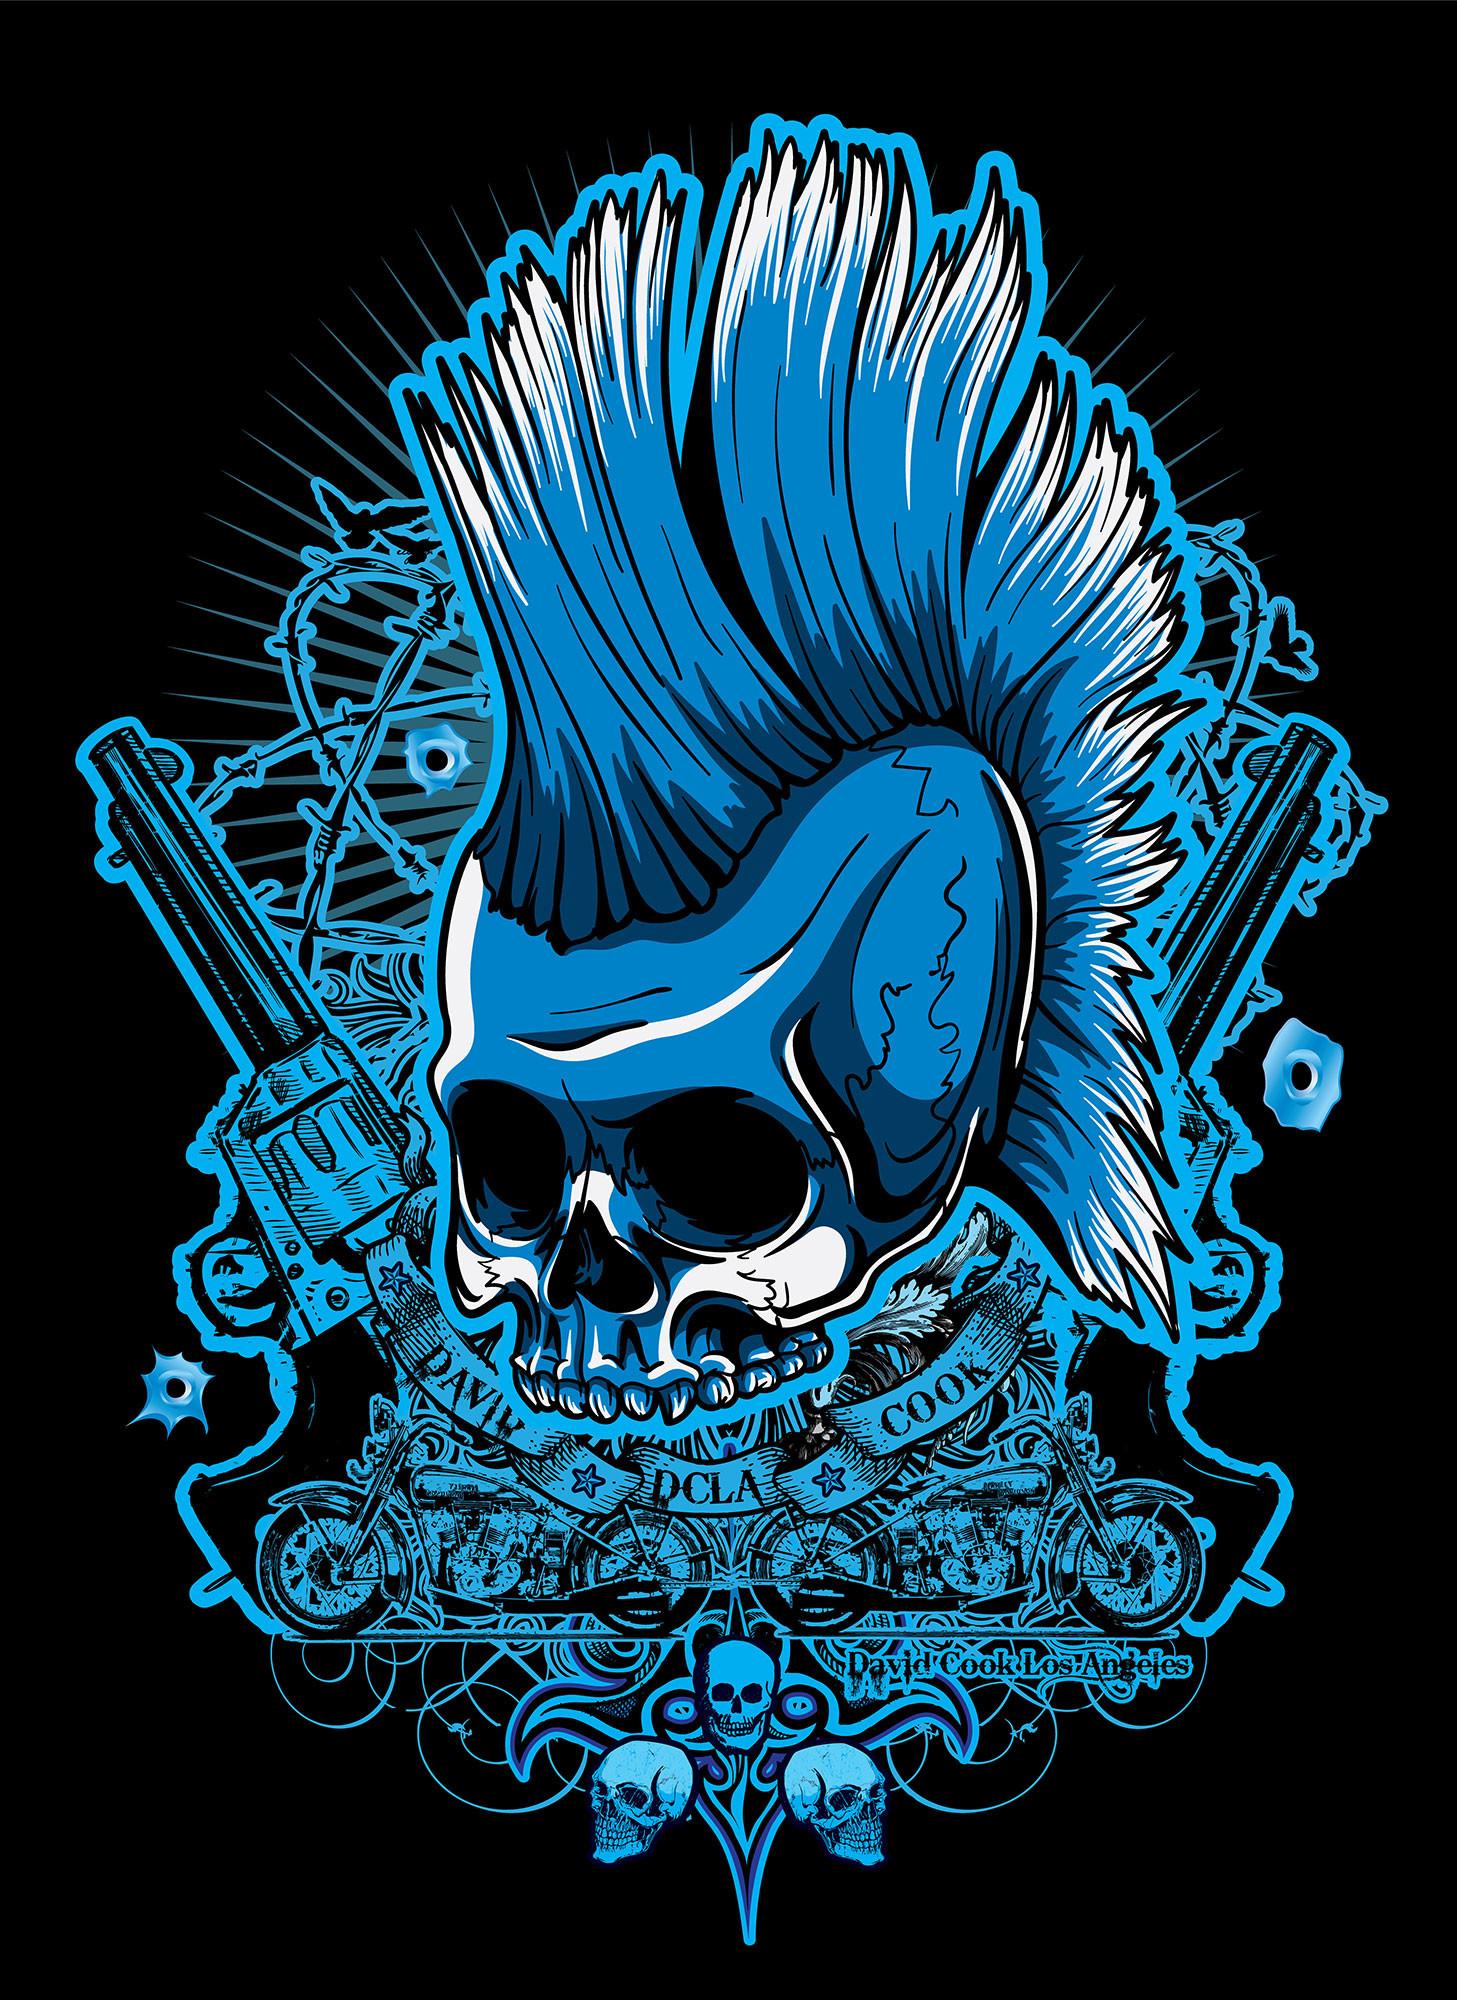 Outlaw Skull Wallpaper Outlaw Skull Wallpaper Outlaw